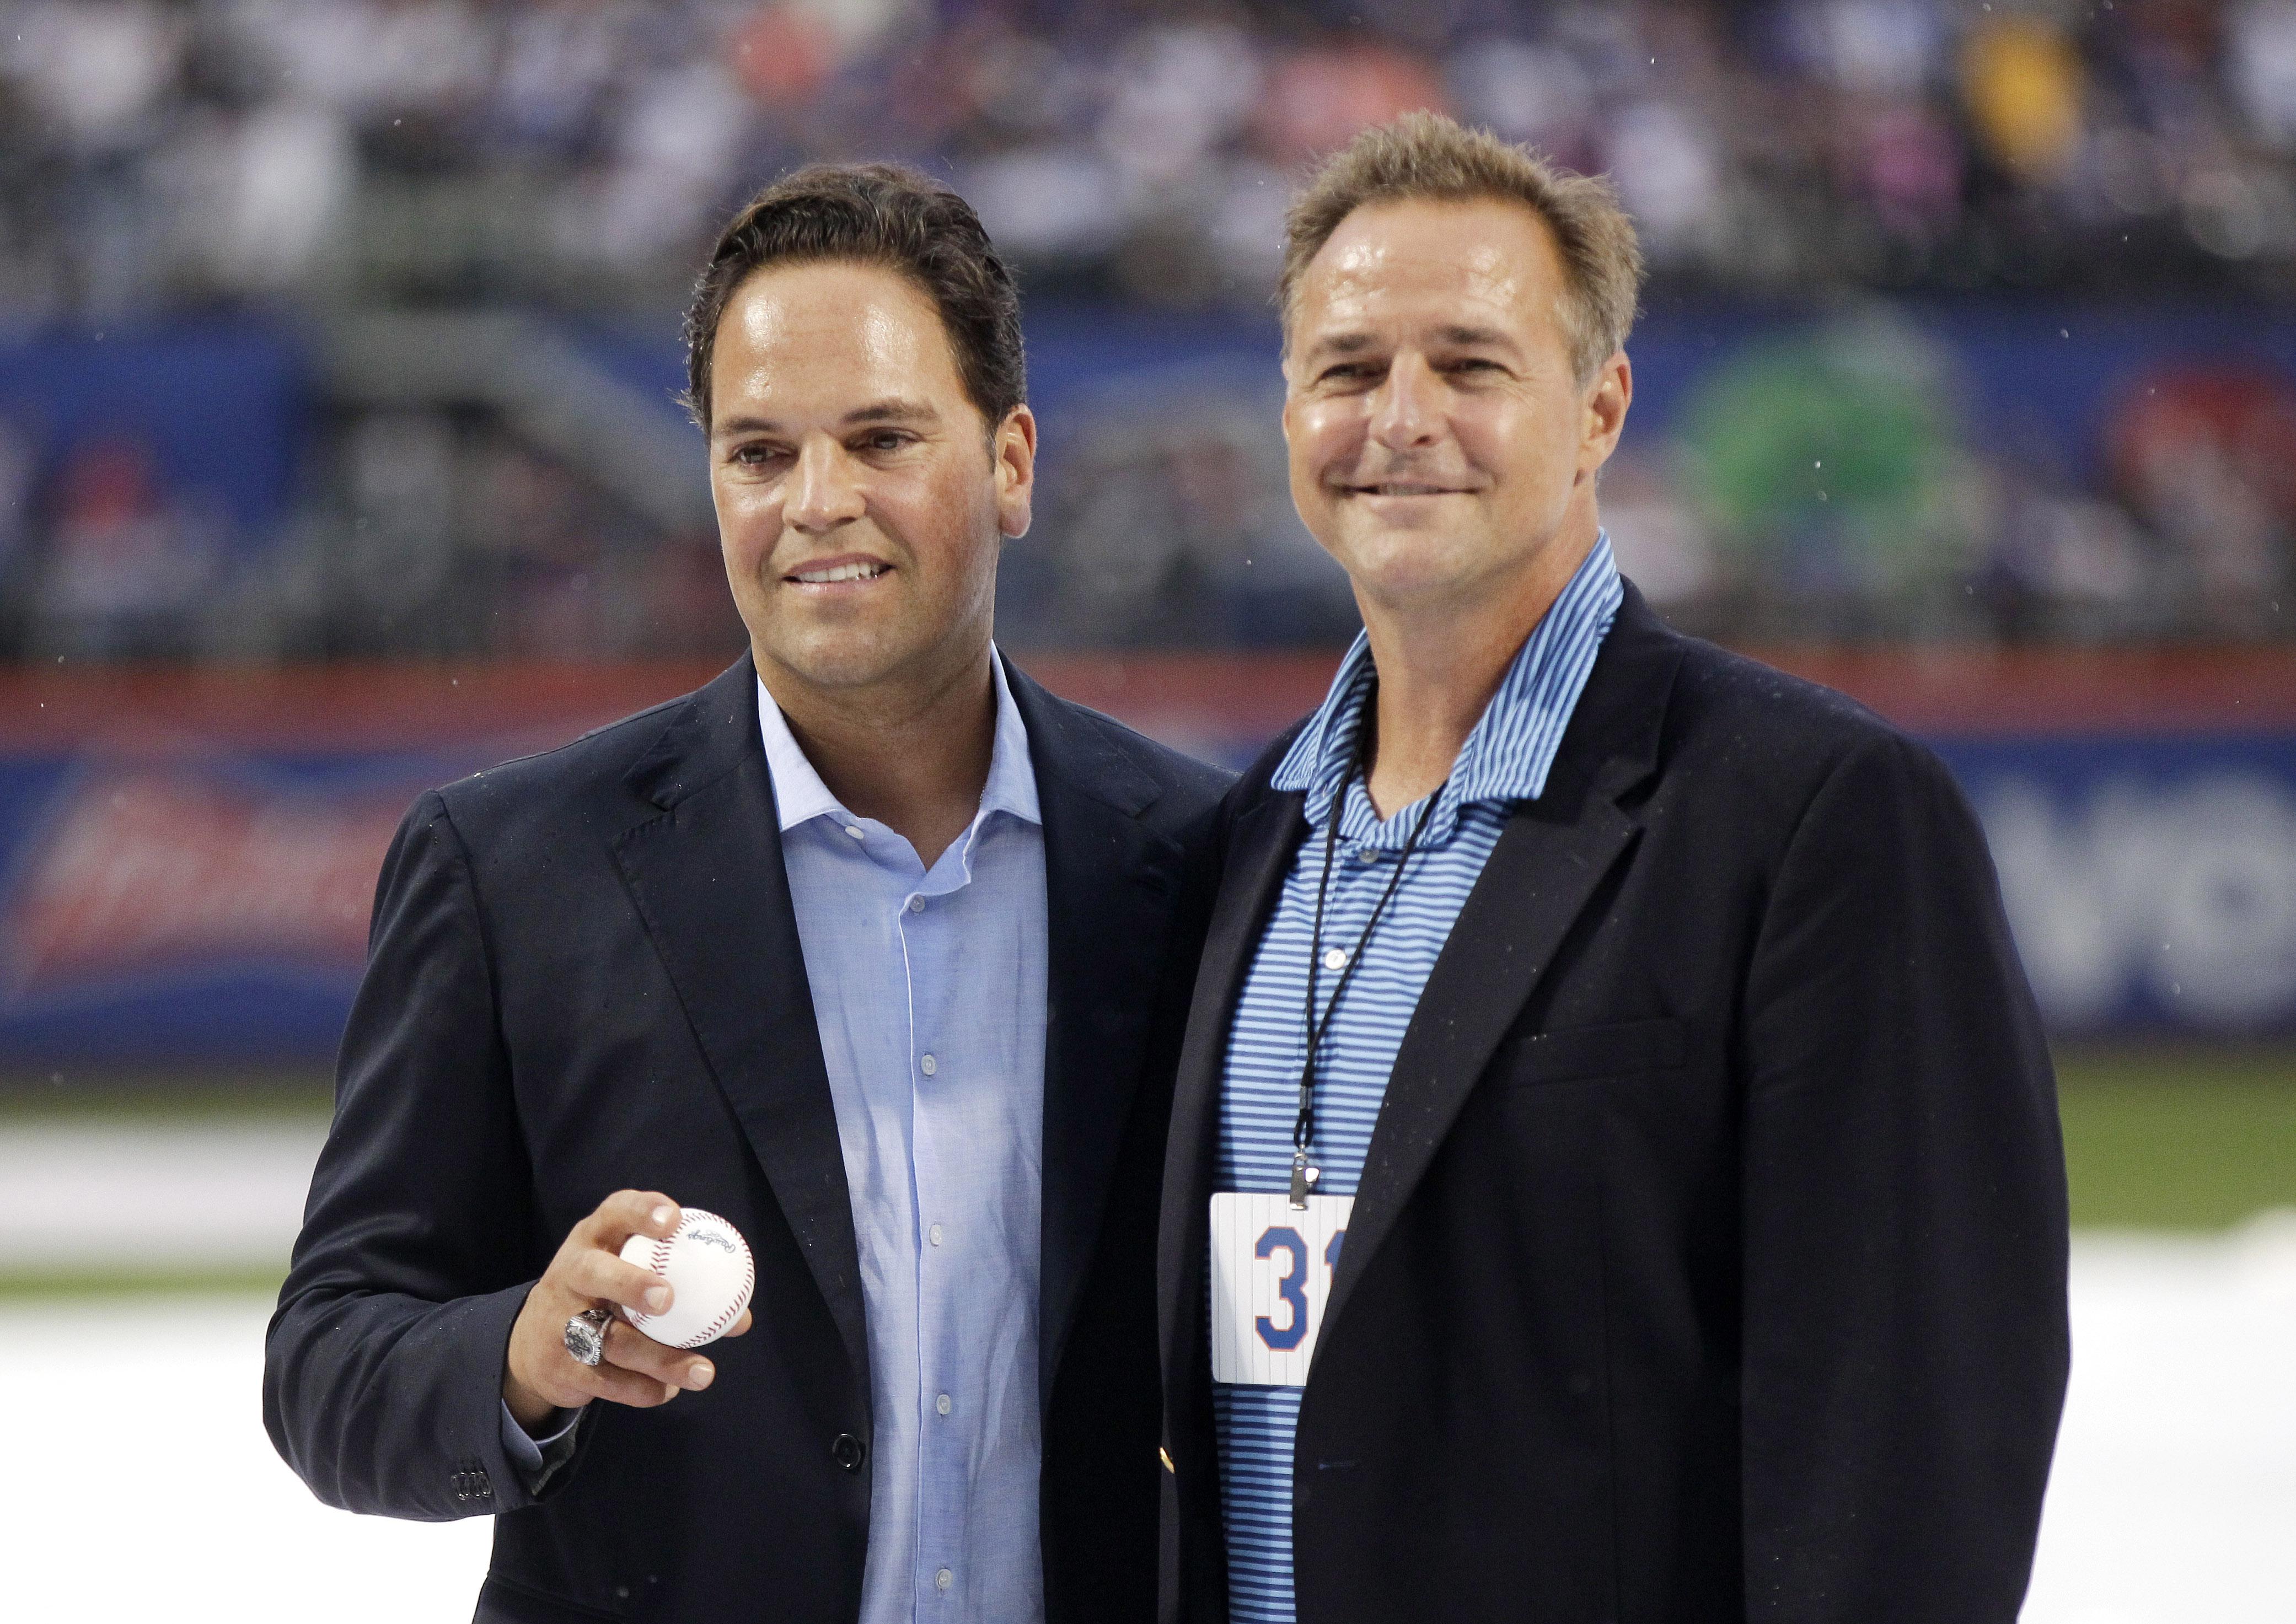 Report: New York Mets Add Al Leiter, John Franco As Baseball Advisers